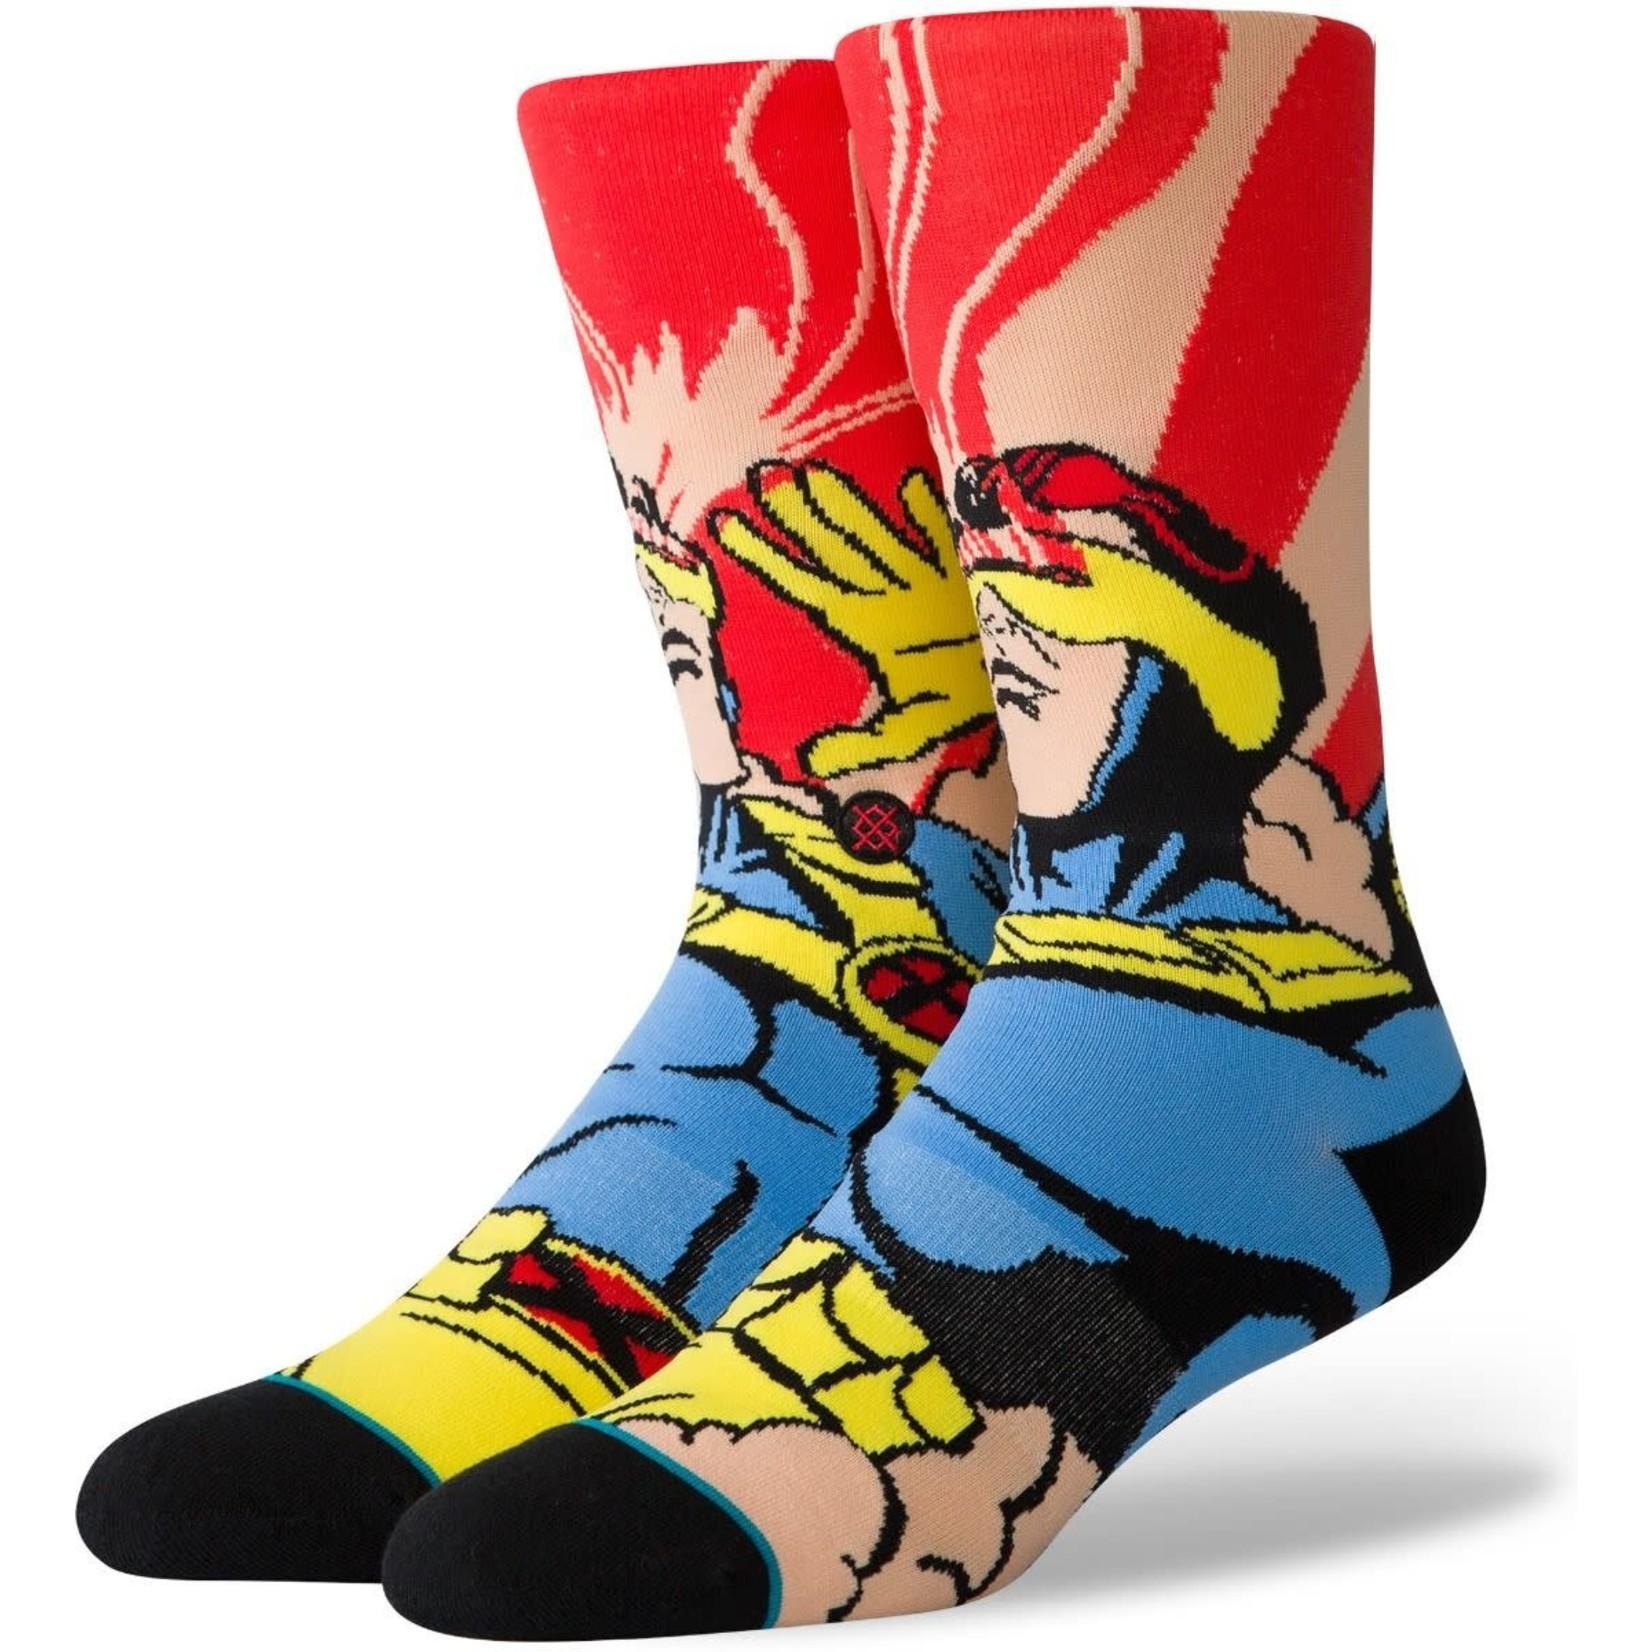 Stance Stance Socks, Xmen Cyclops